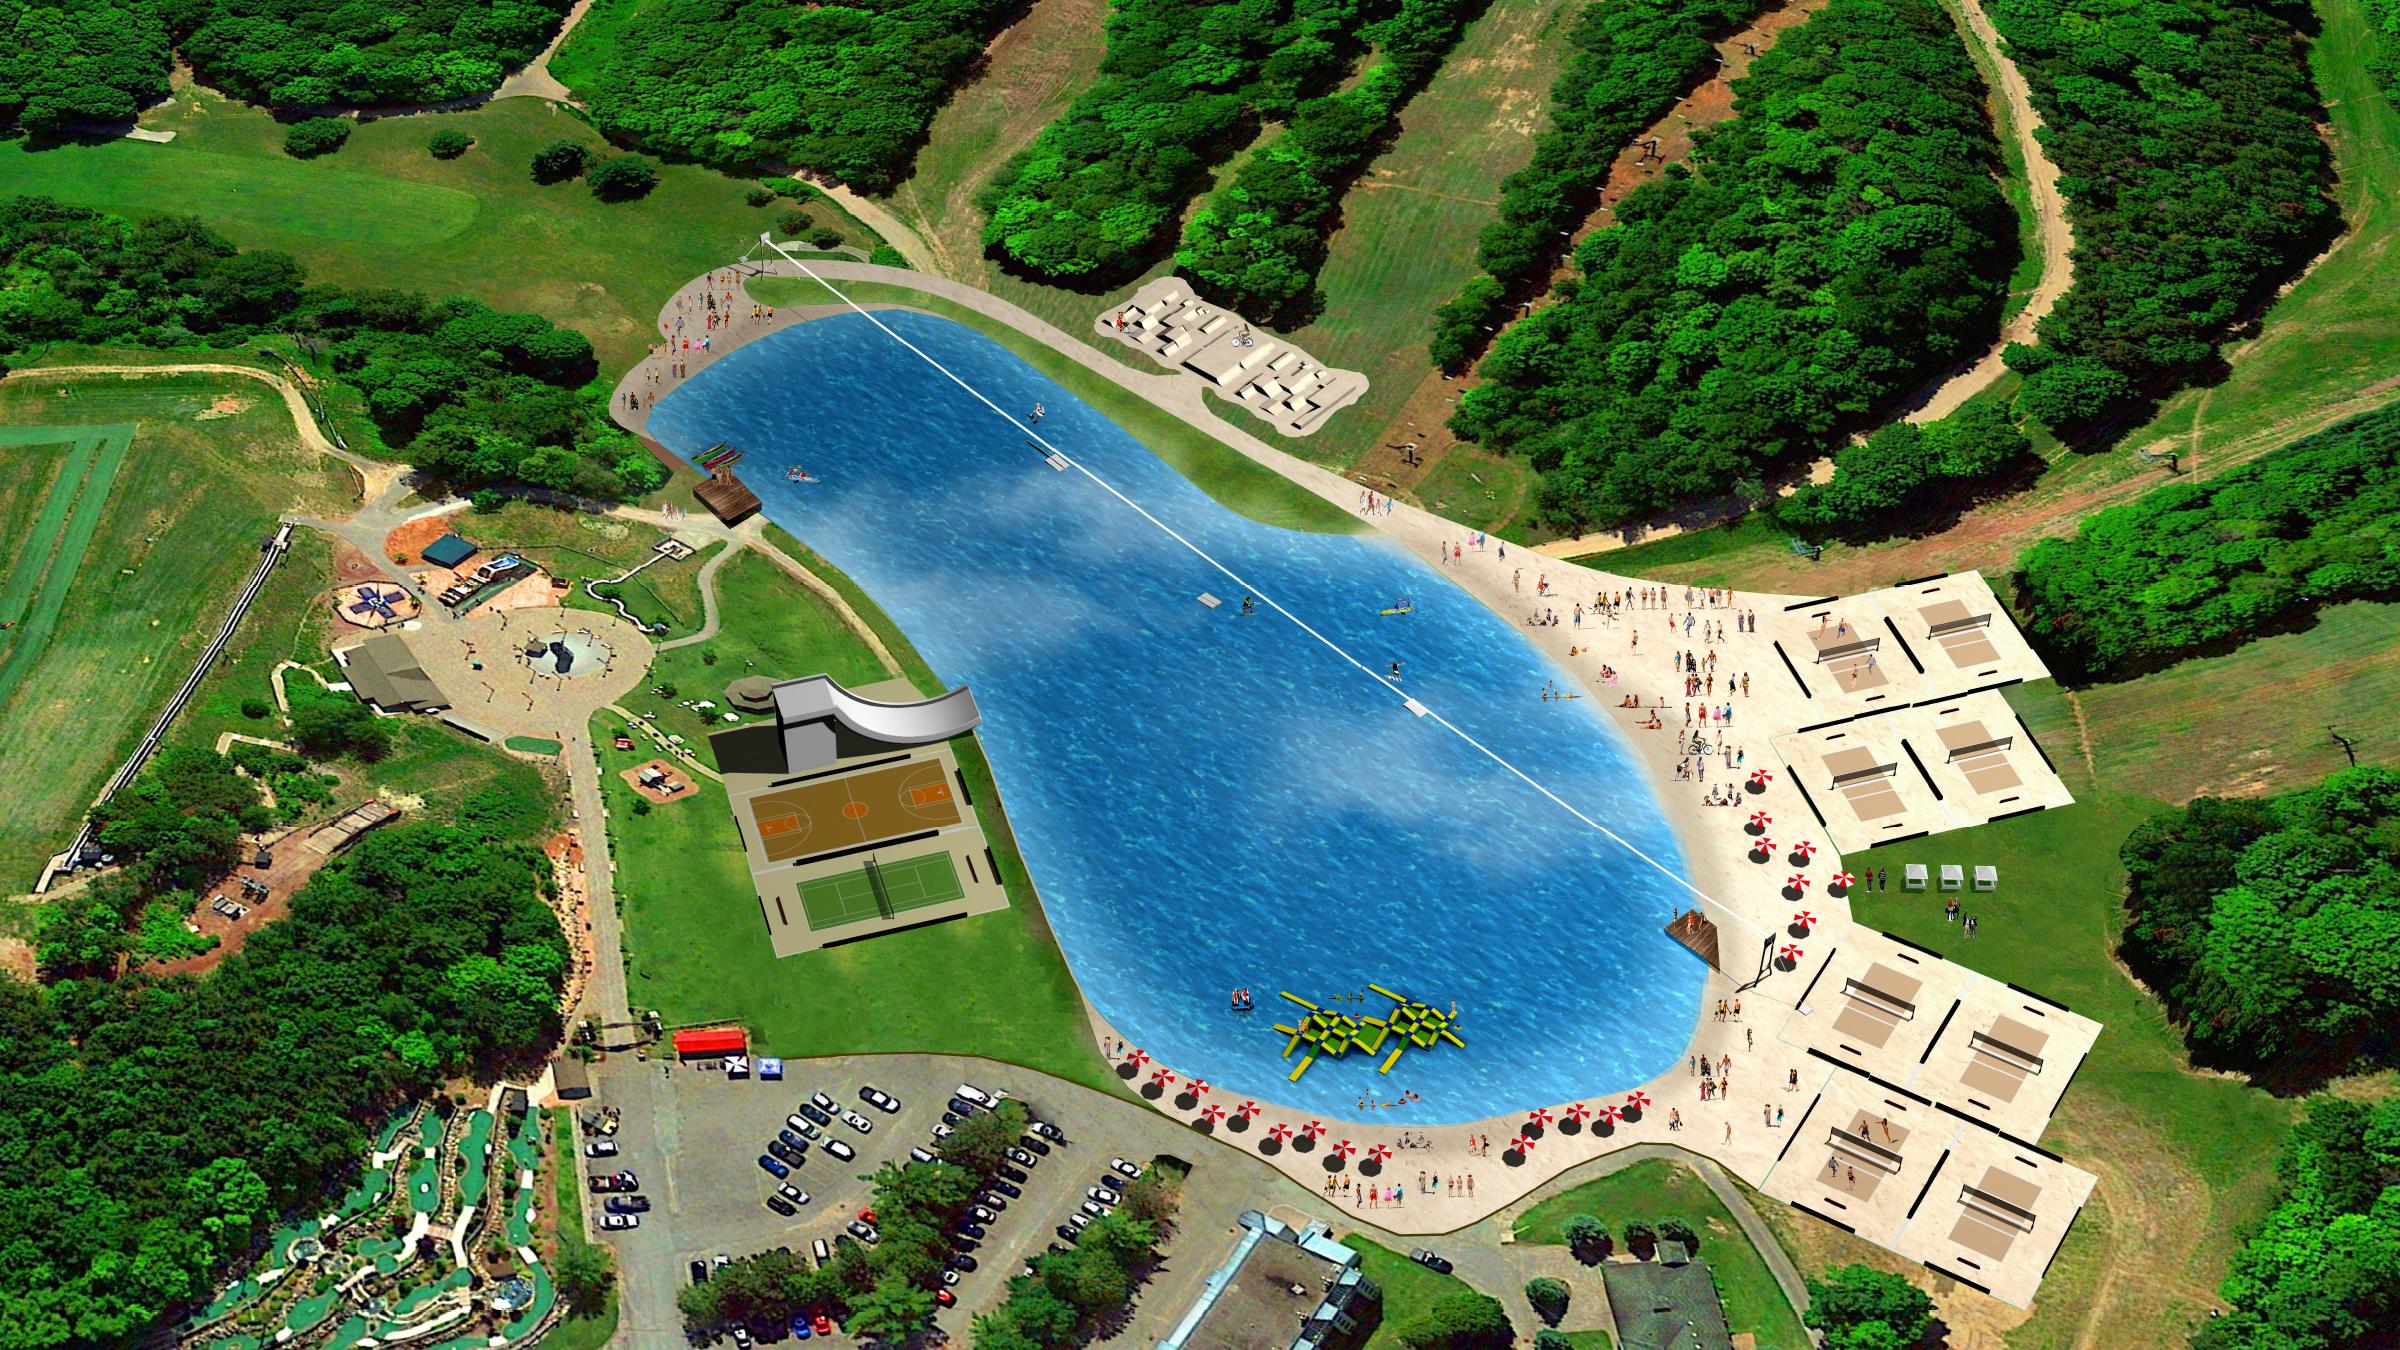 Horseshoe Resort Spa